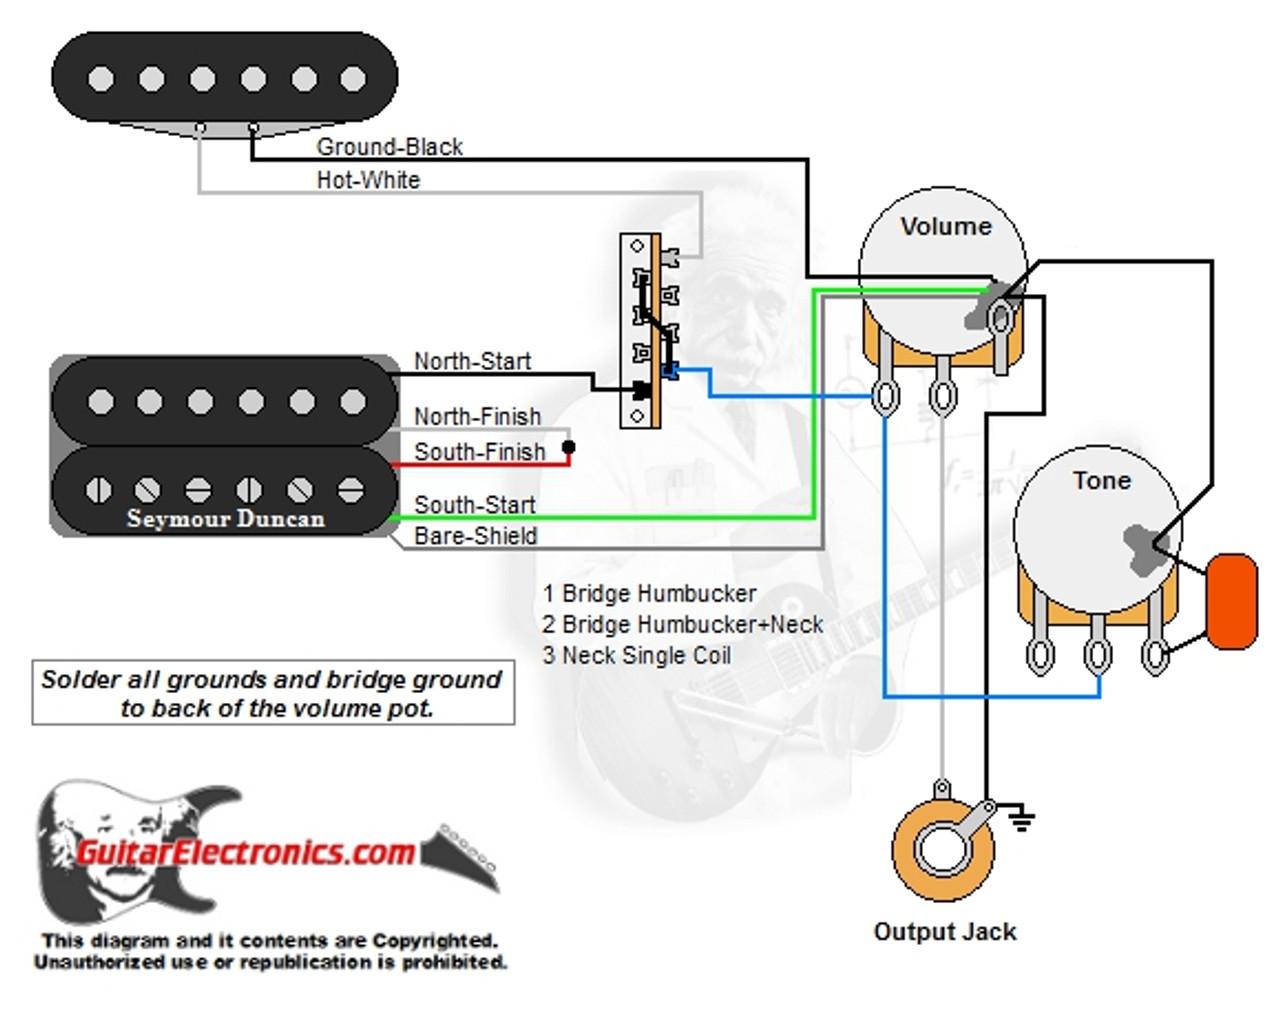 diagramshumbucker wiring diagrams 1 humbucker 1 single coil 3 way lever switch 1 volume 1 tone 001 humbucker 1 [ 1280 x 1021 Pixel ]